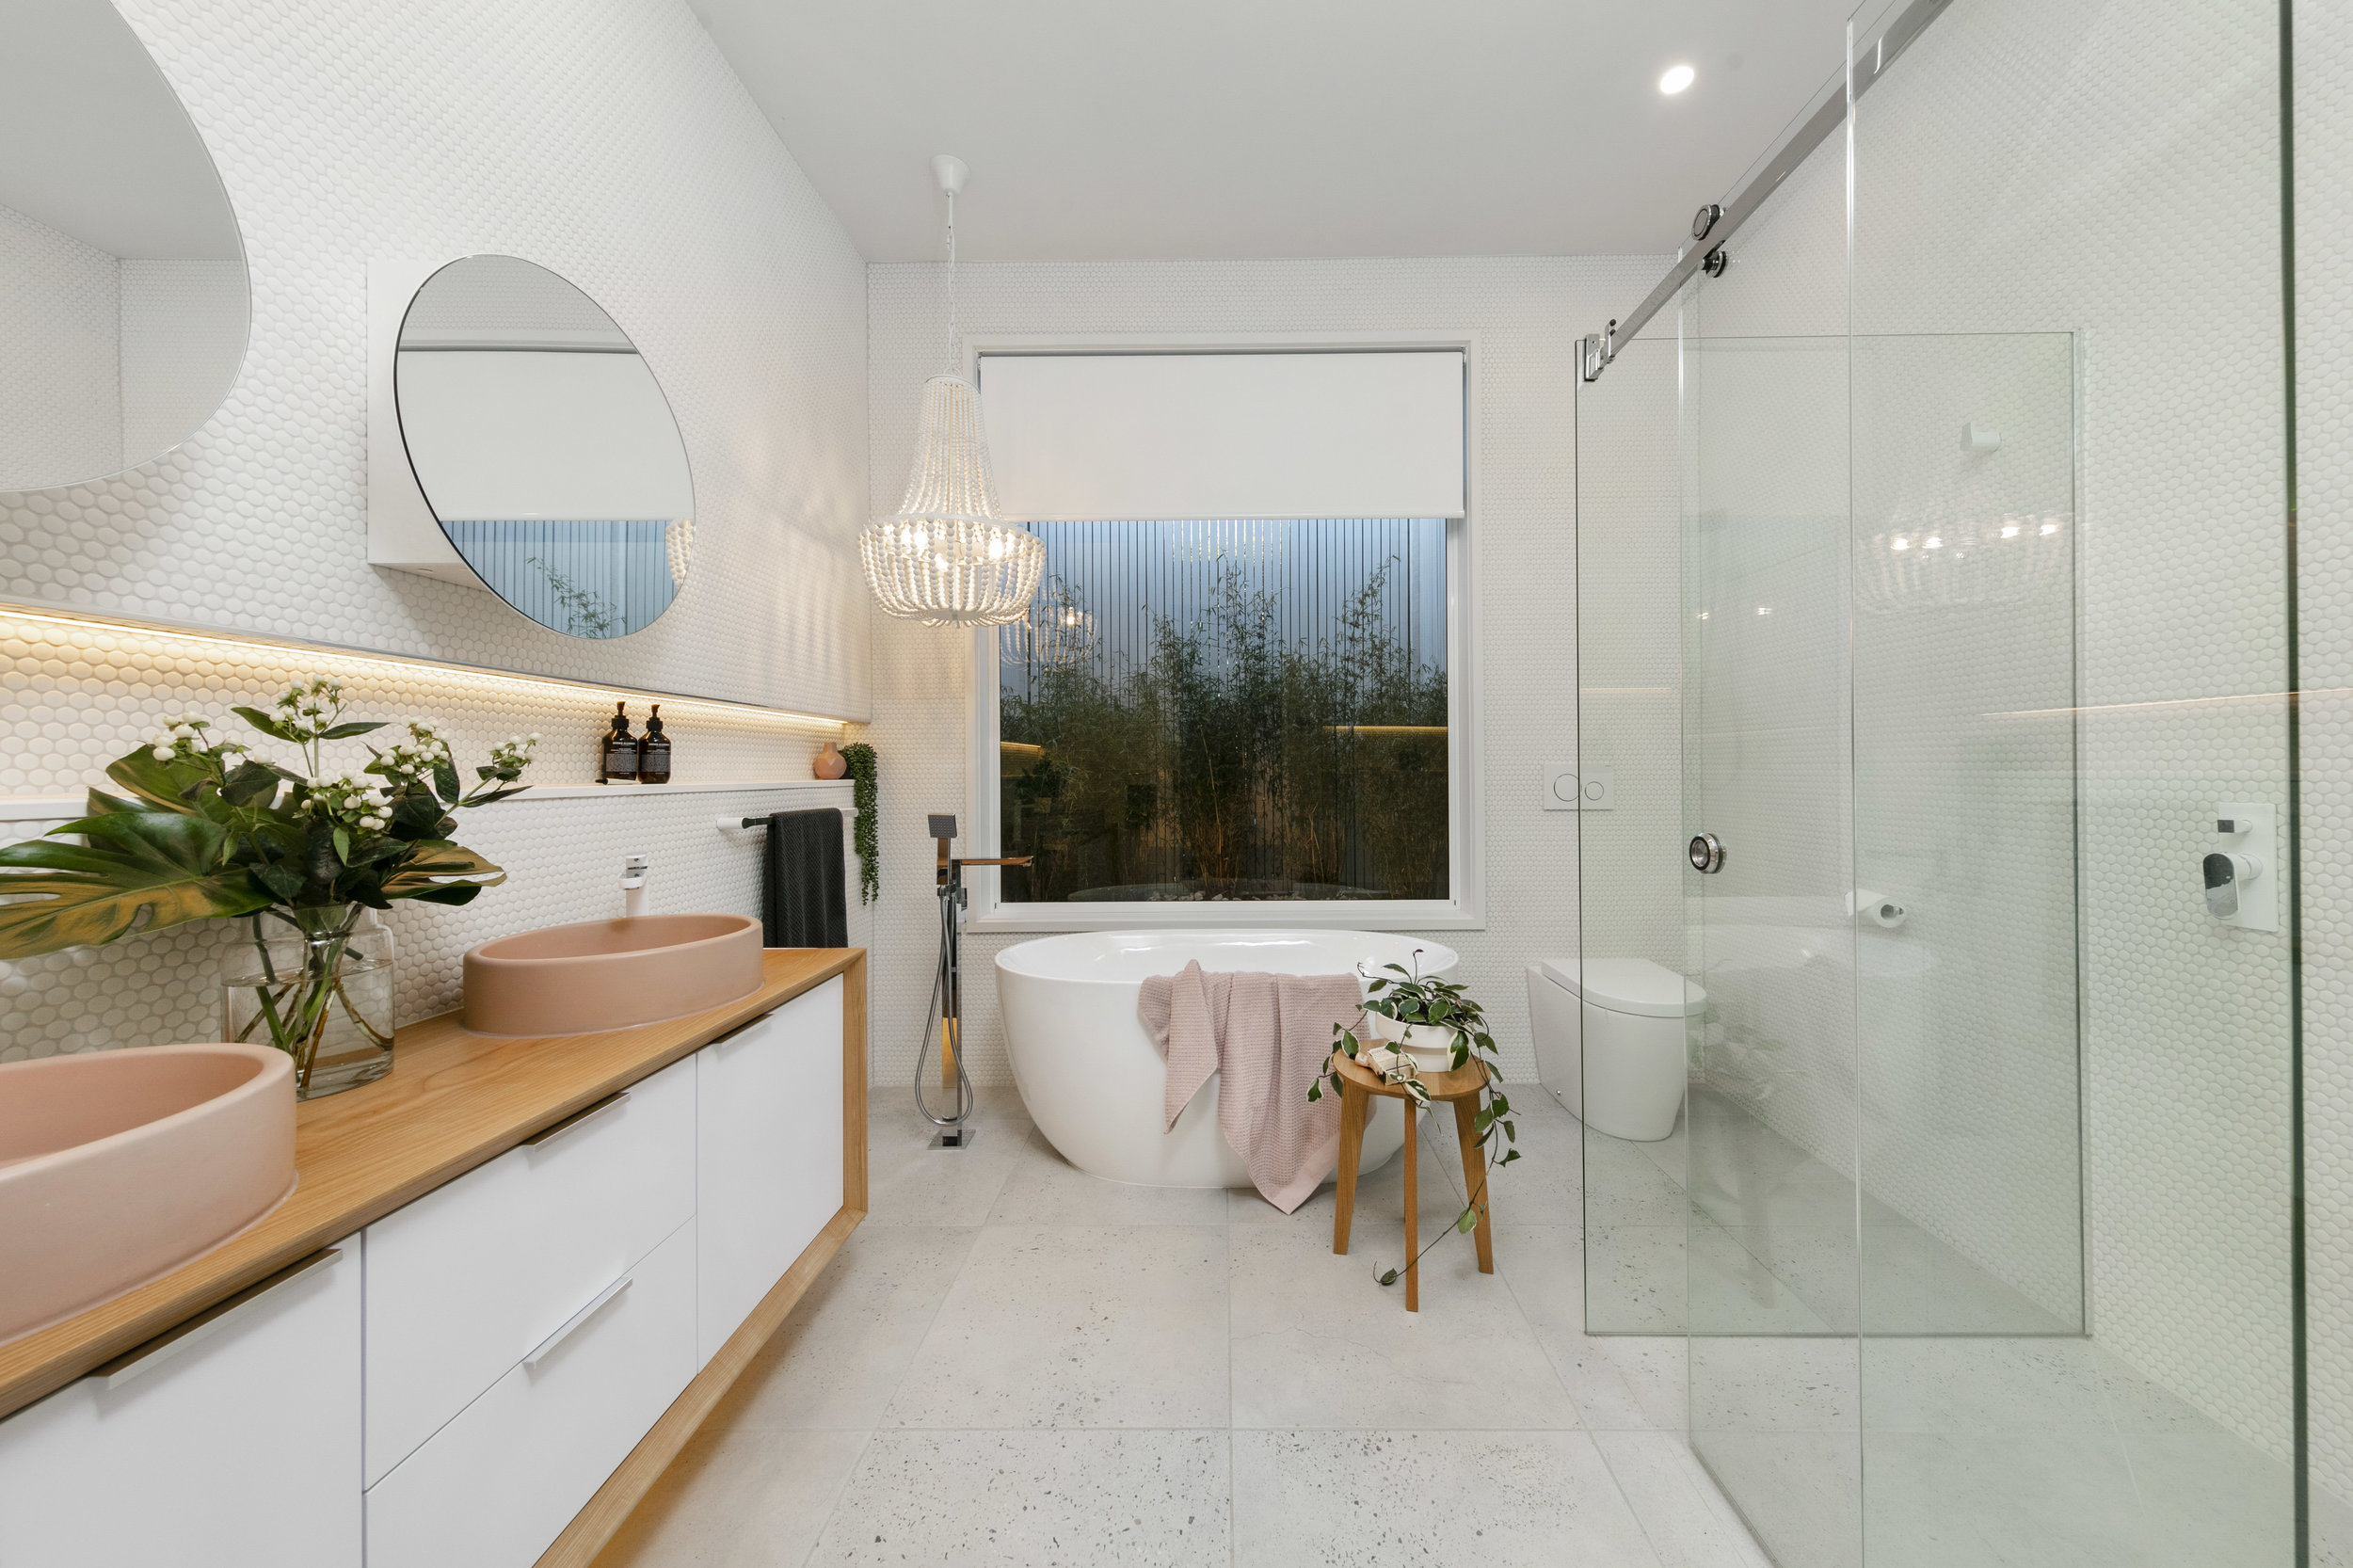 Mornington bathroom renovation - (AFTER)